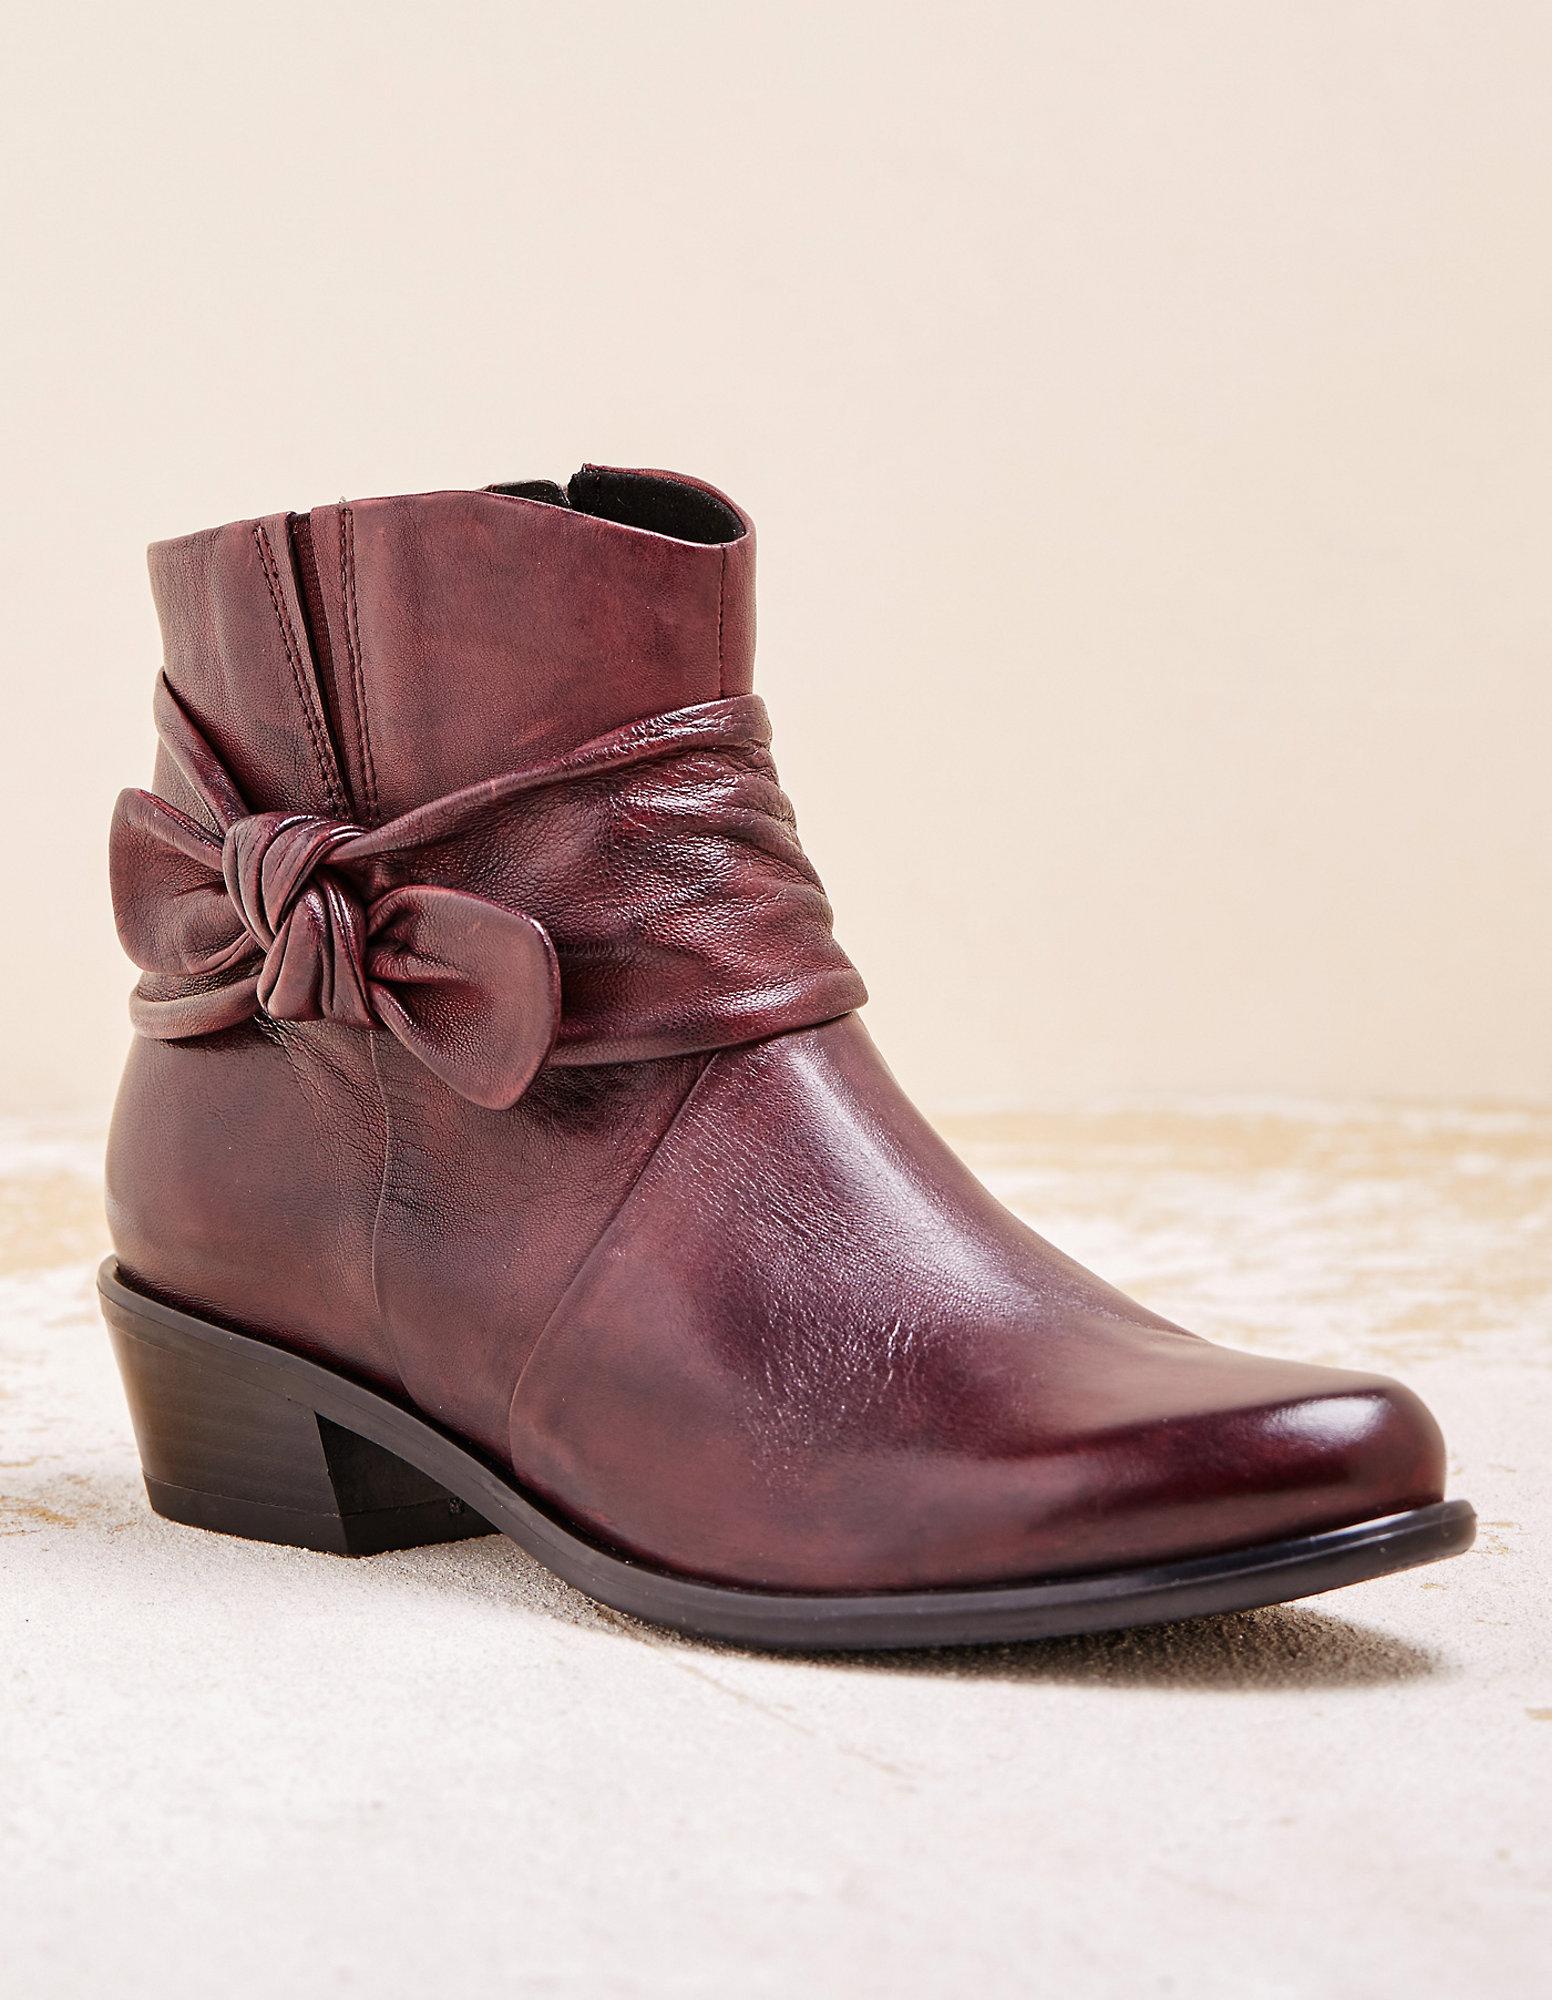 Caprice Stiefeletten Bordeaux Schuhe Online Verkauf